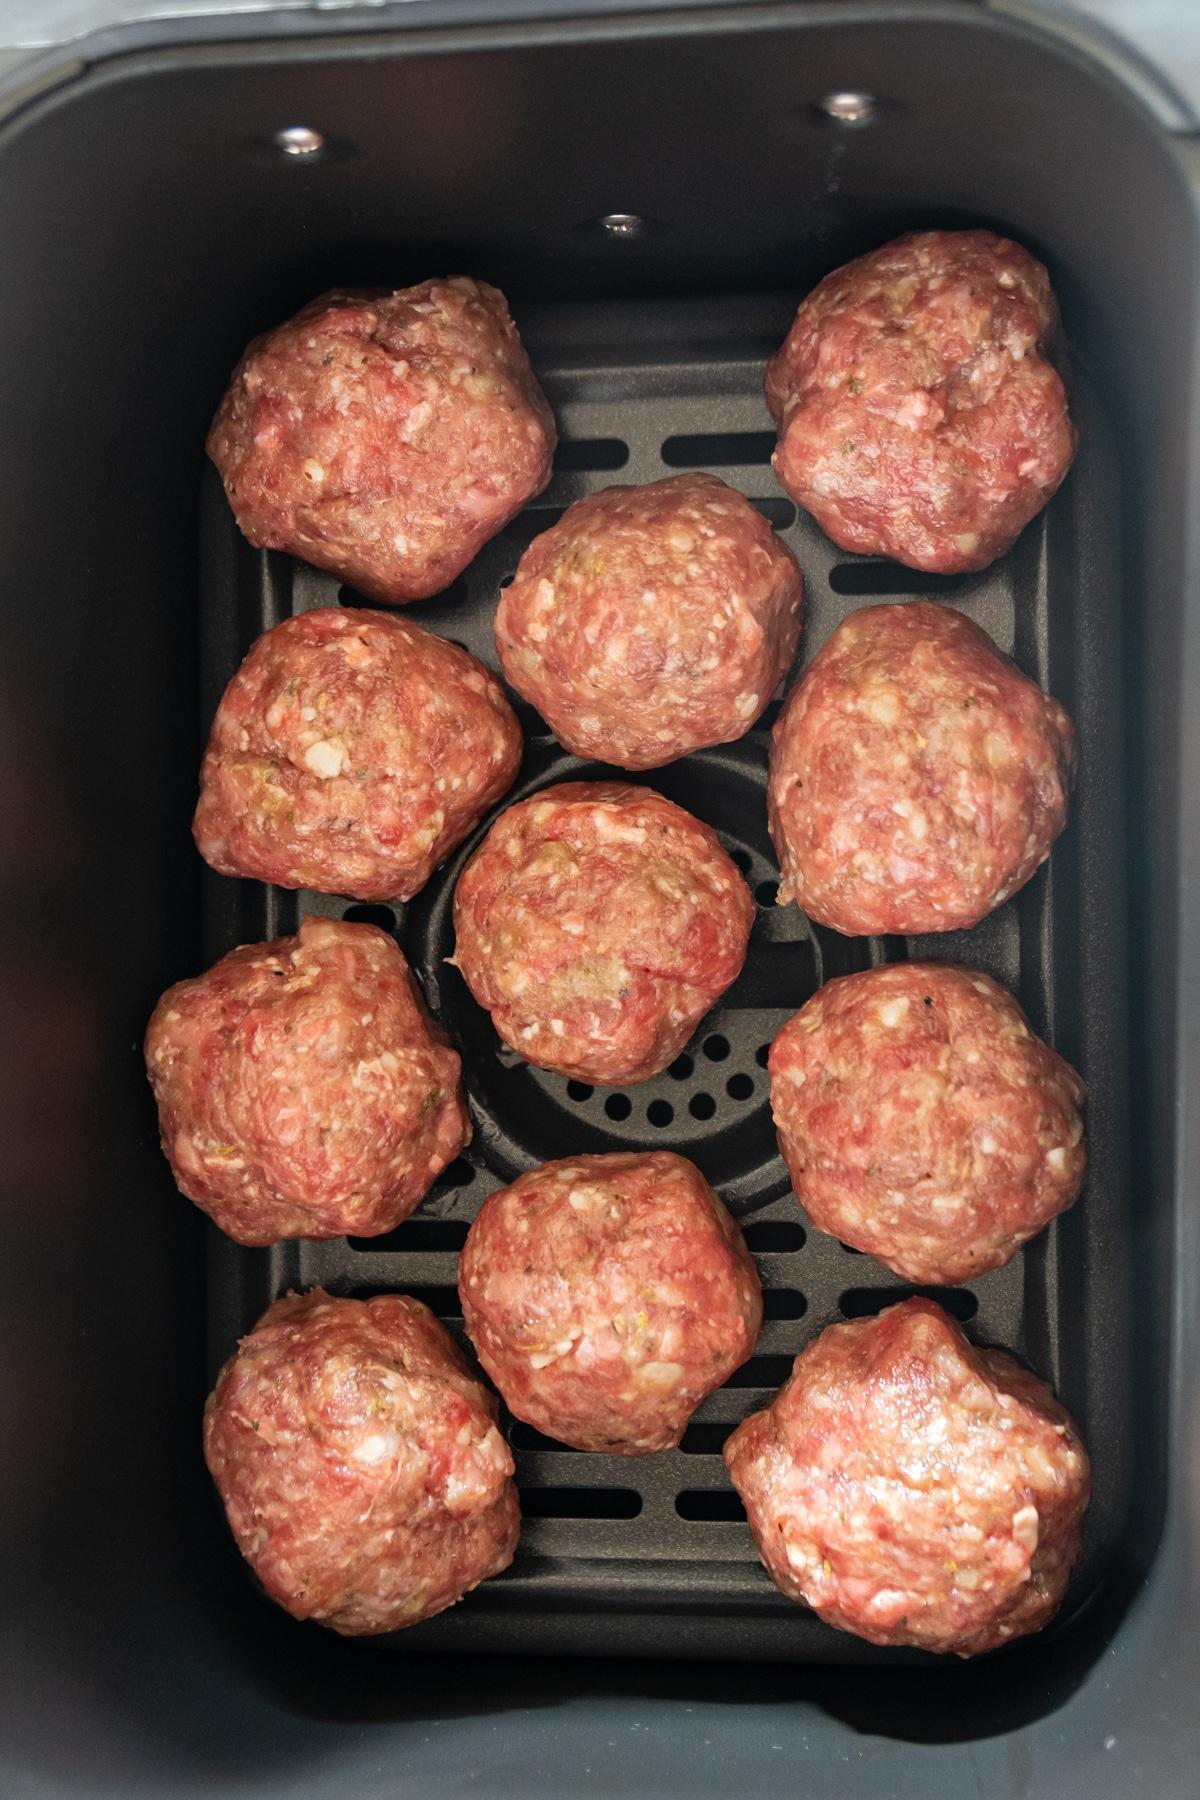 cheese stuffed meatballs in an air fryer